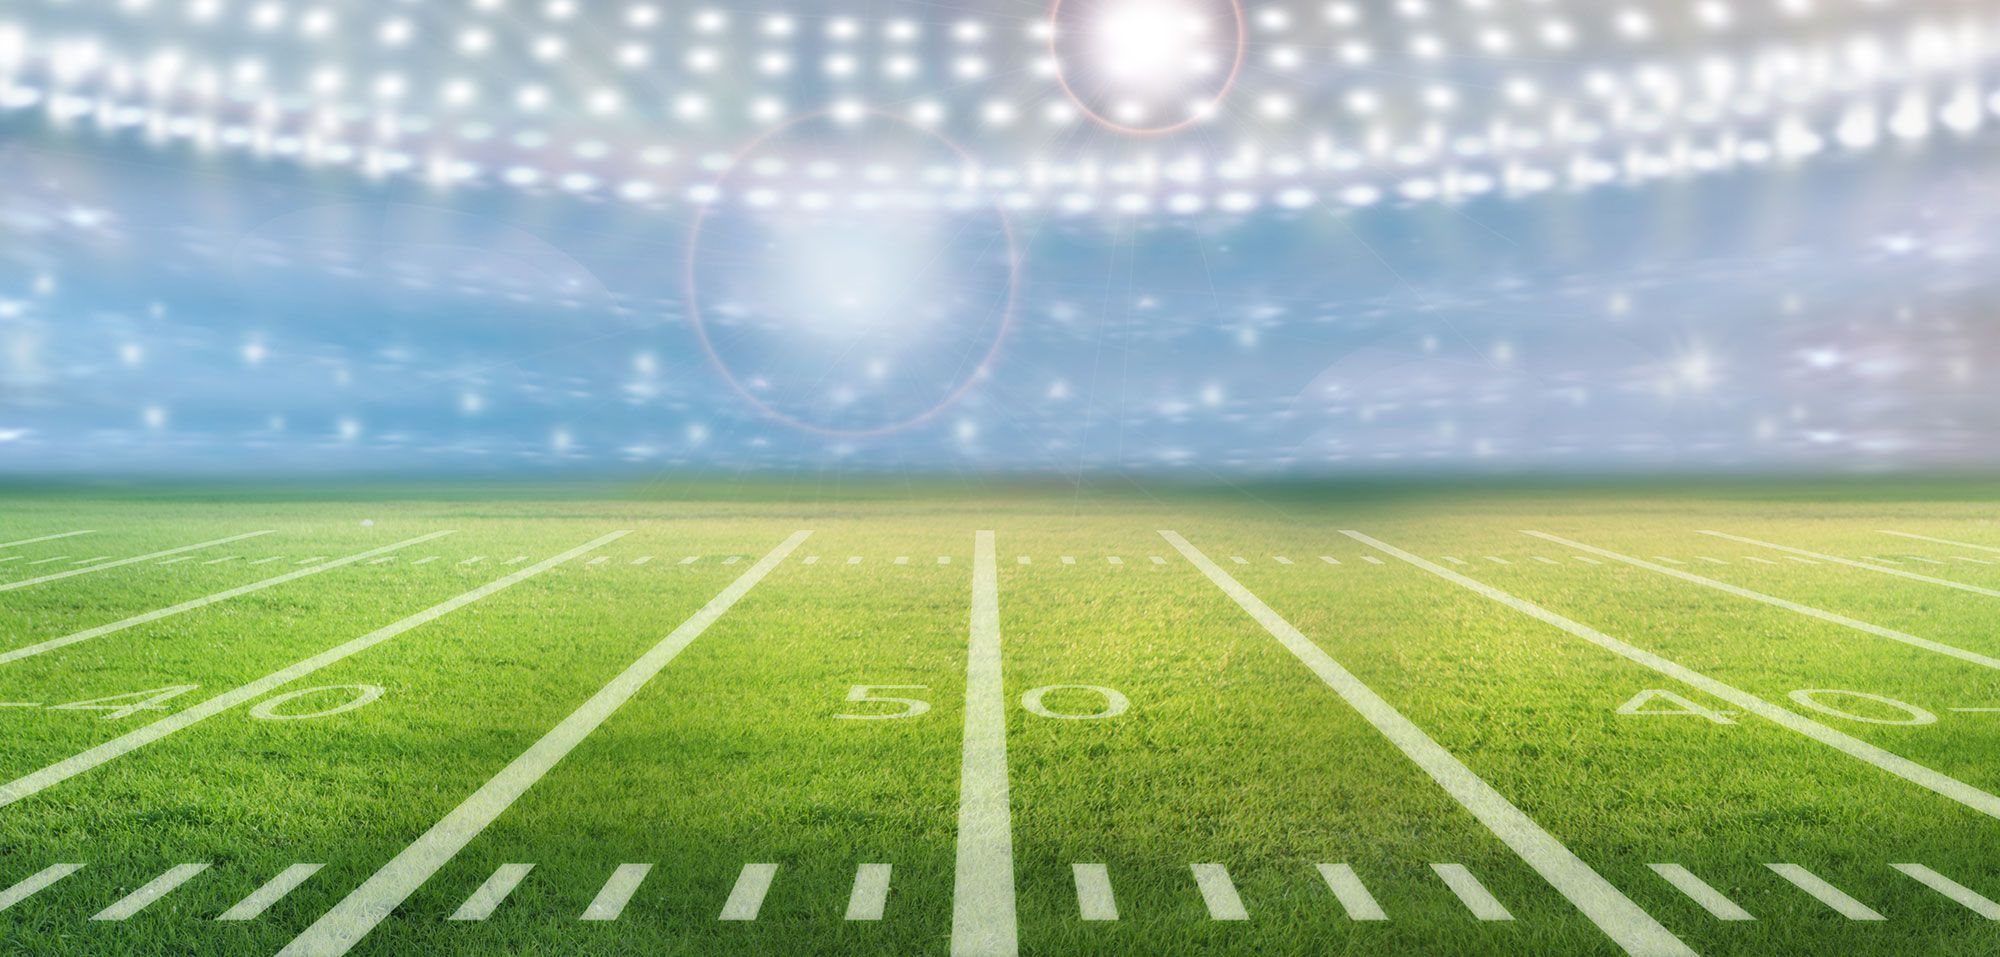 Background Football Field Football Field Background Anime Football Football Field